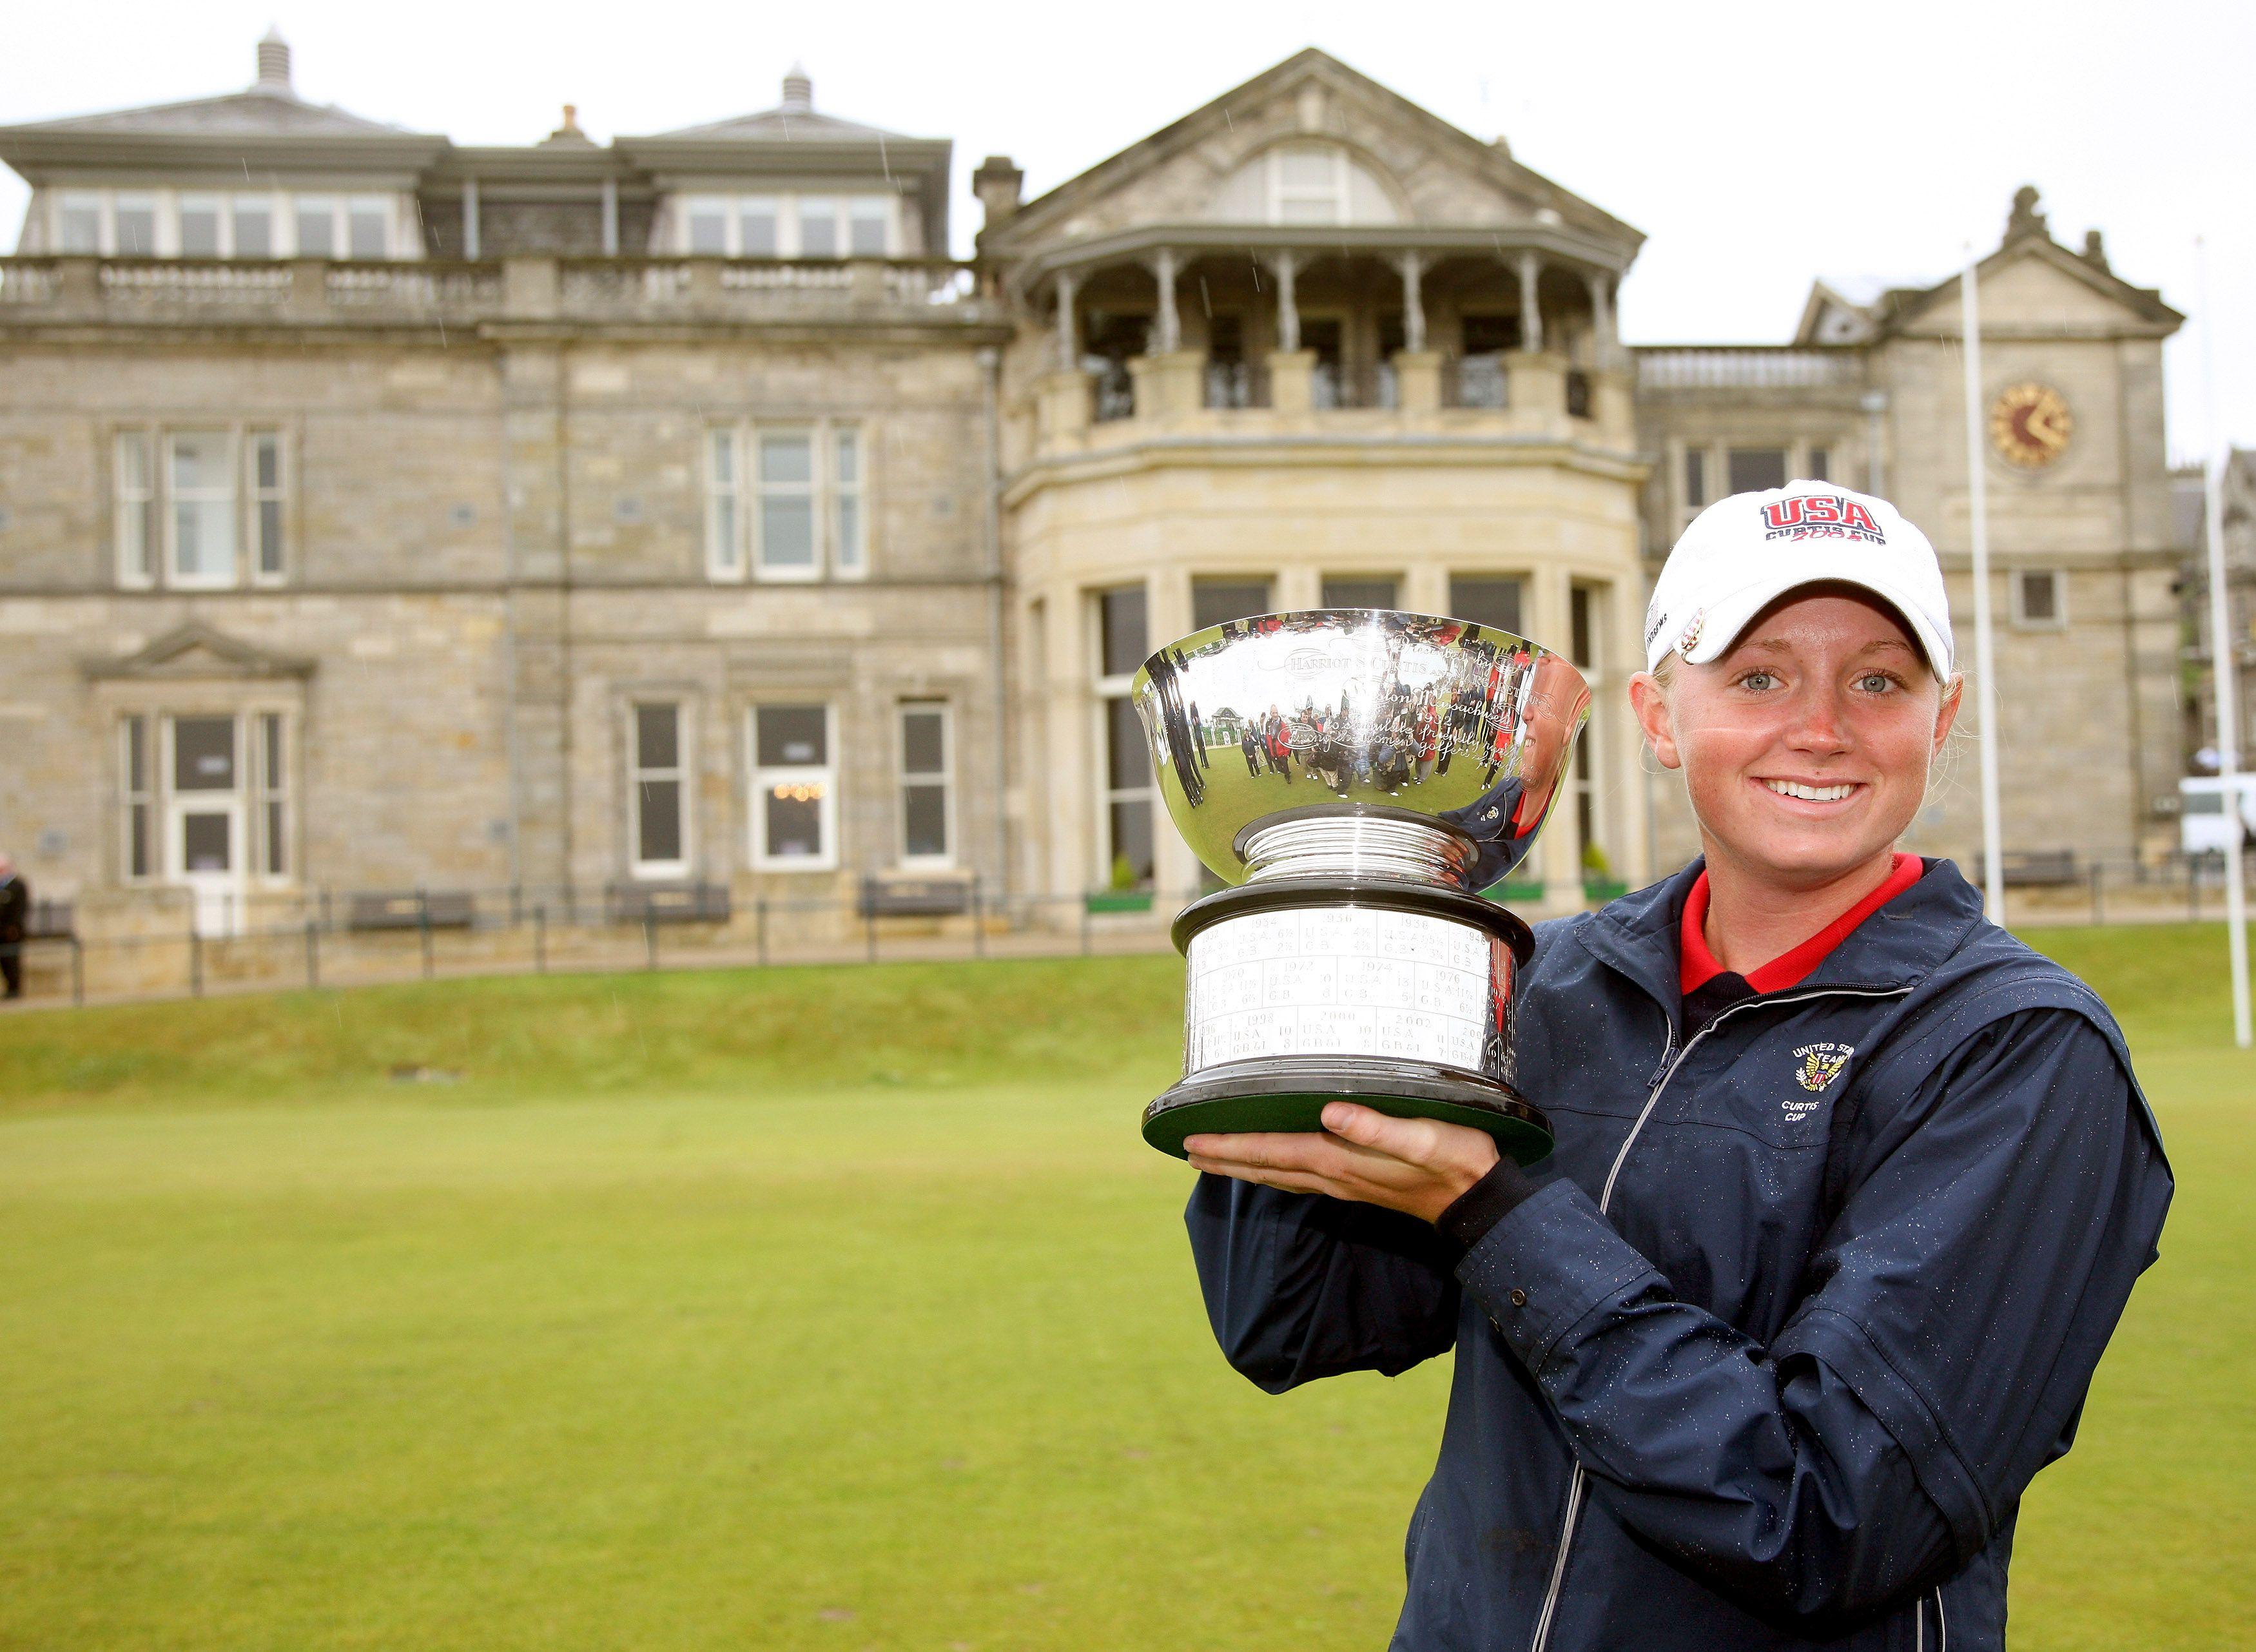 Curtis Cup Golf Match (USA vs. Great Britain & Ireland)